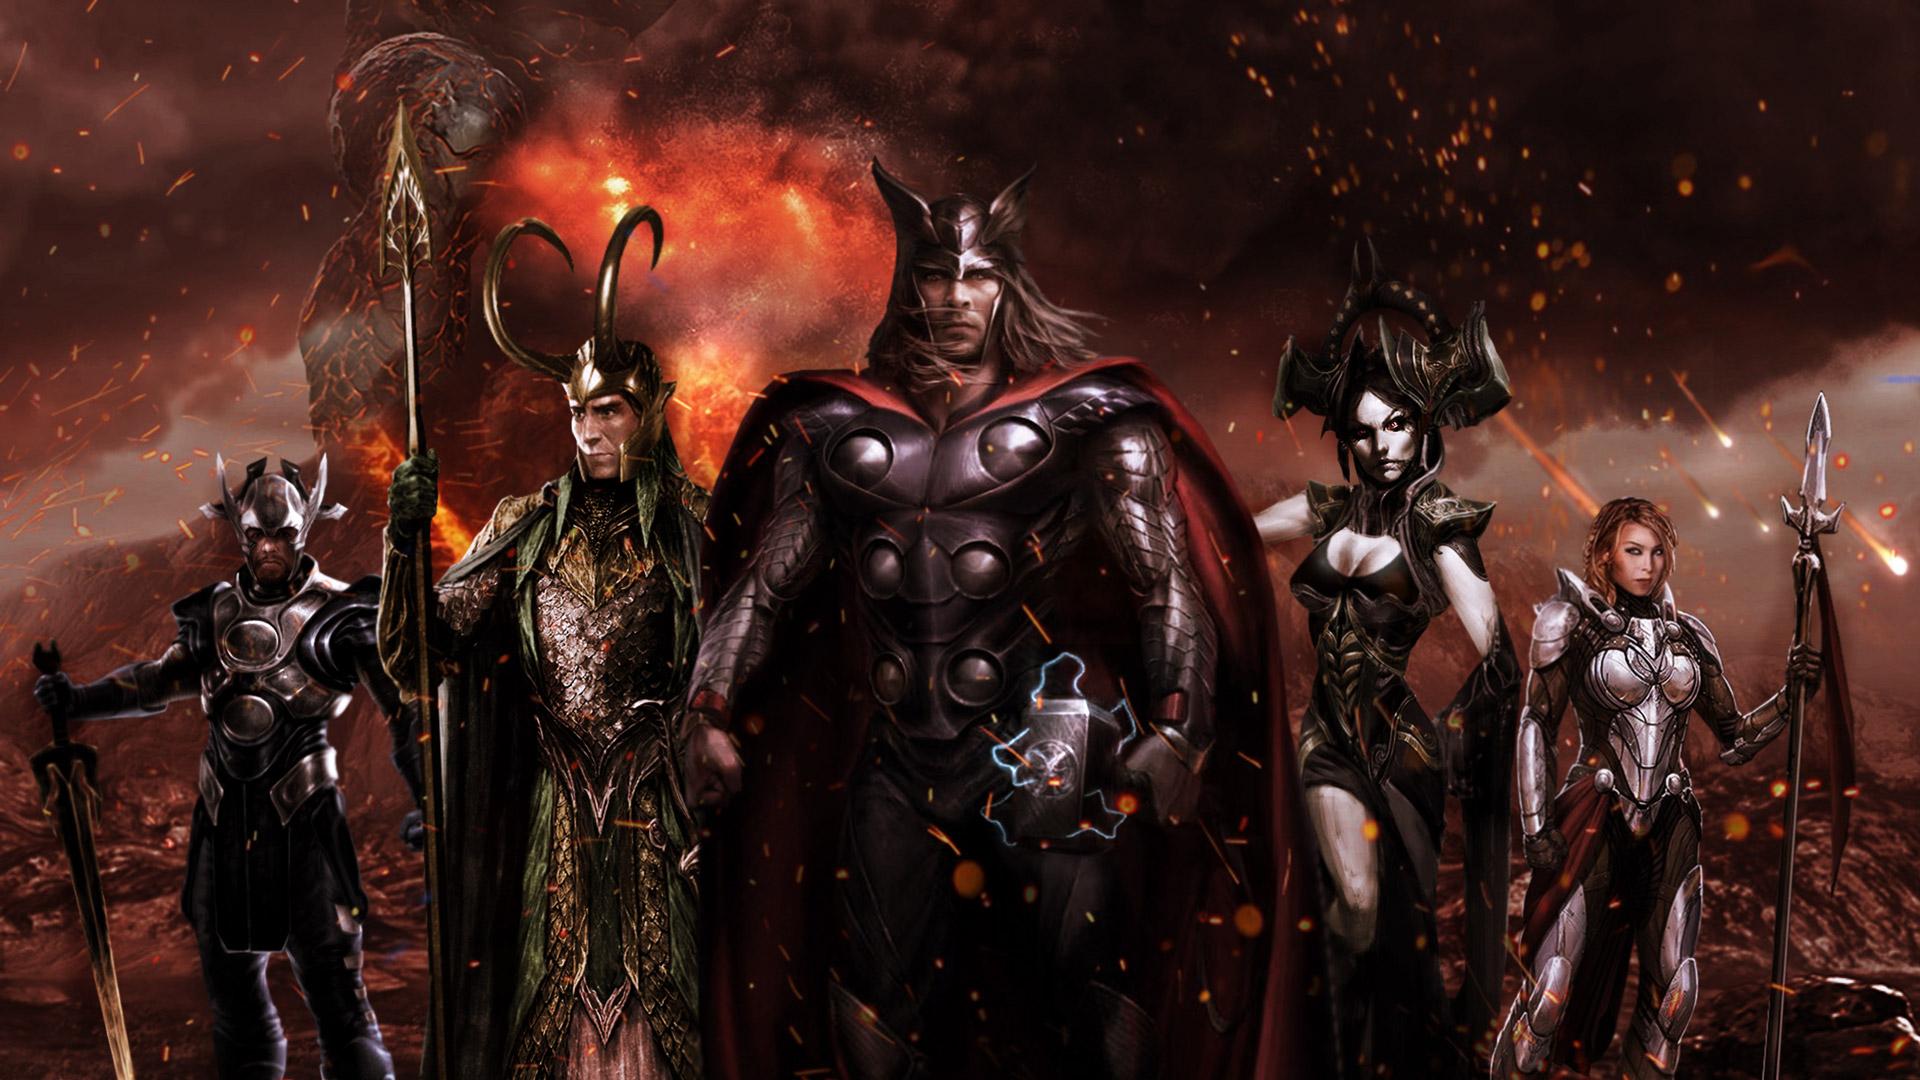 Thor ragnarok fan poster hd movies 4k wallpapers images - Thor ragnarok hd wallpapers download ...